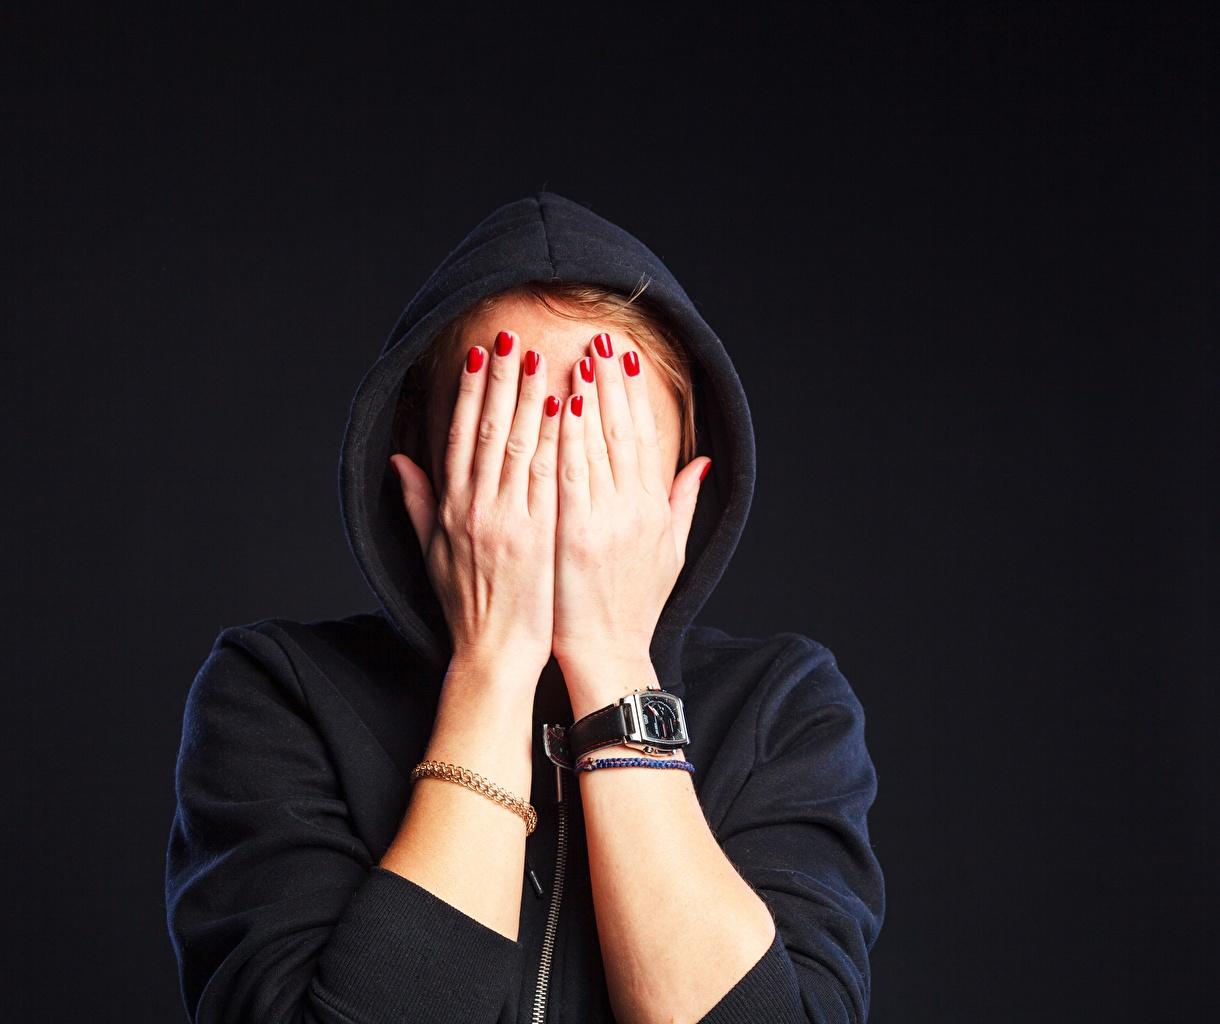 Desktop Hintergrundbilder Maniküre Armbanduhr junge Frauen Hand Kapuze Mädchens junge frau